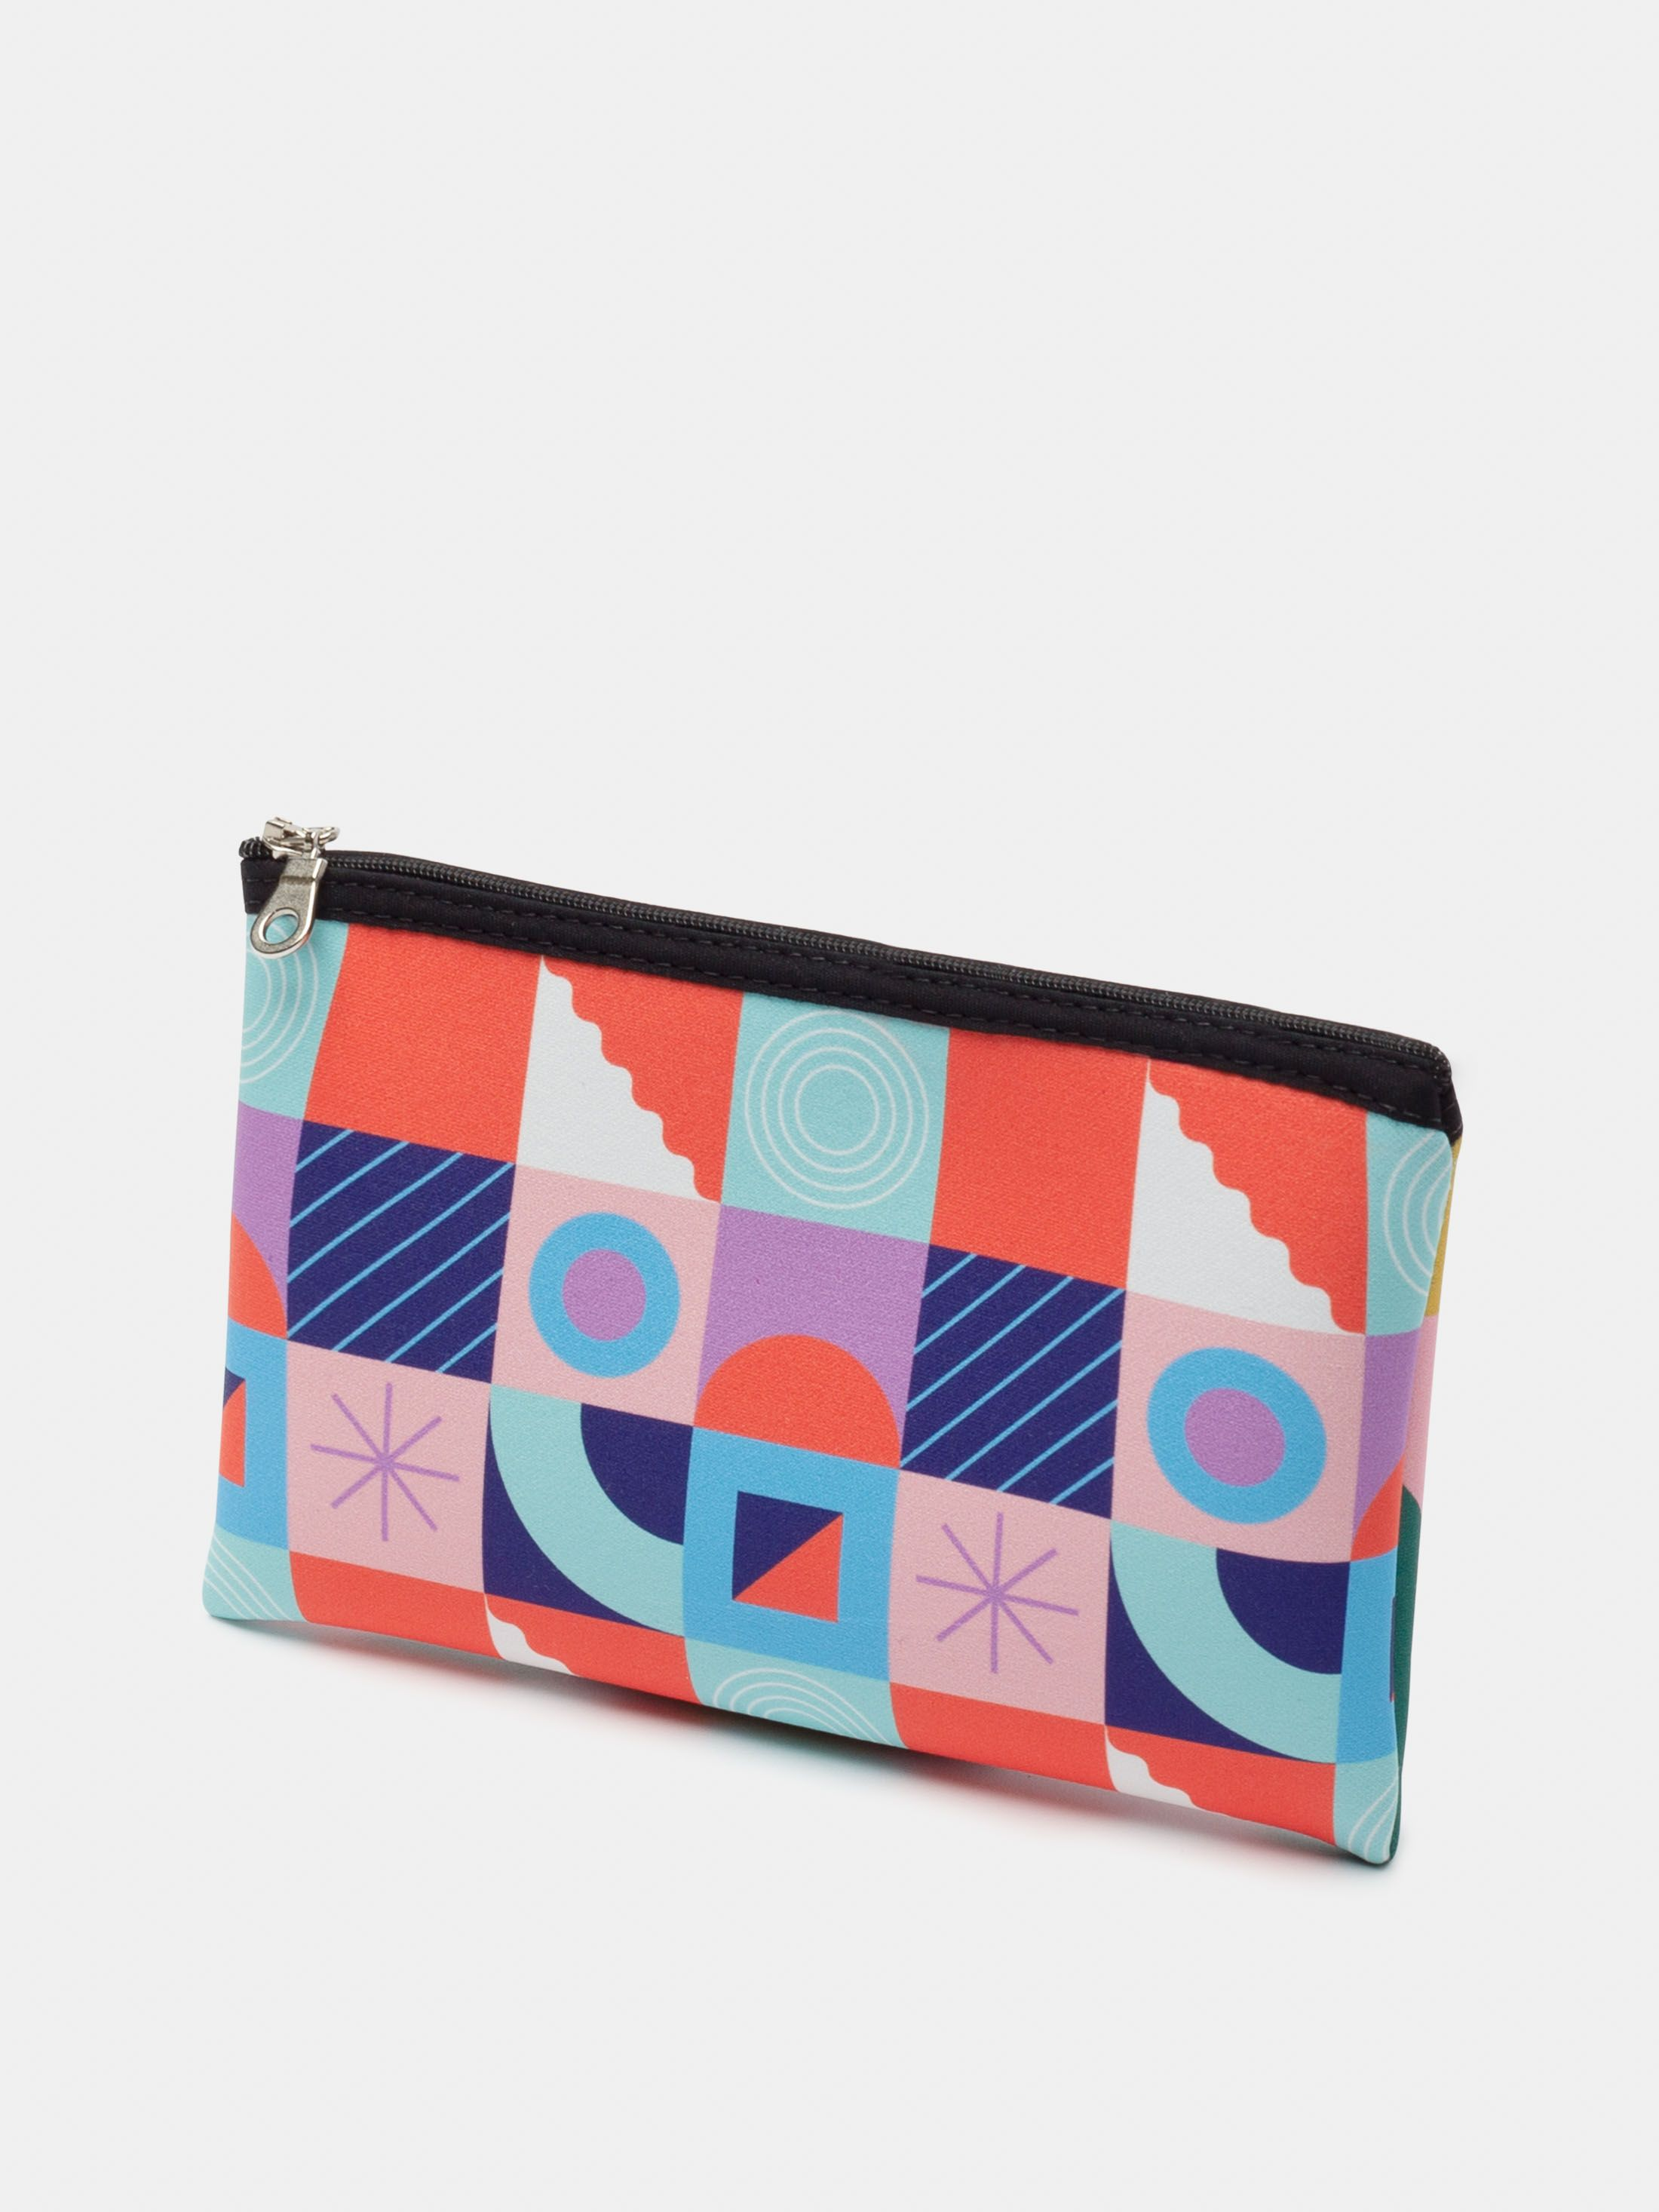 custom printed zipper pouch